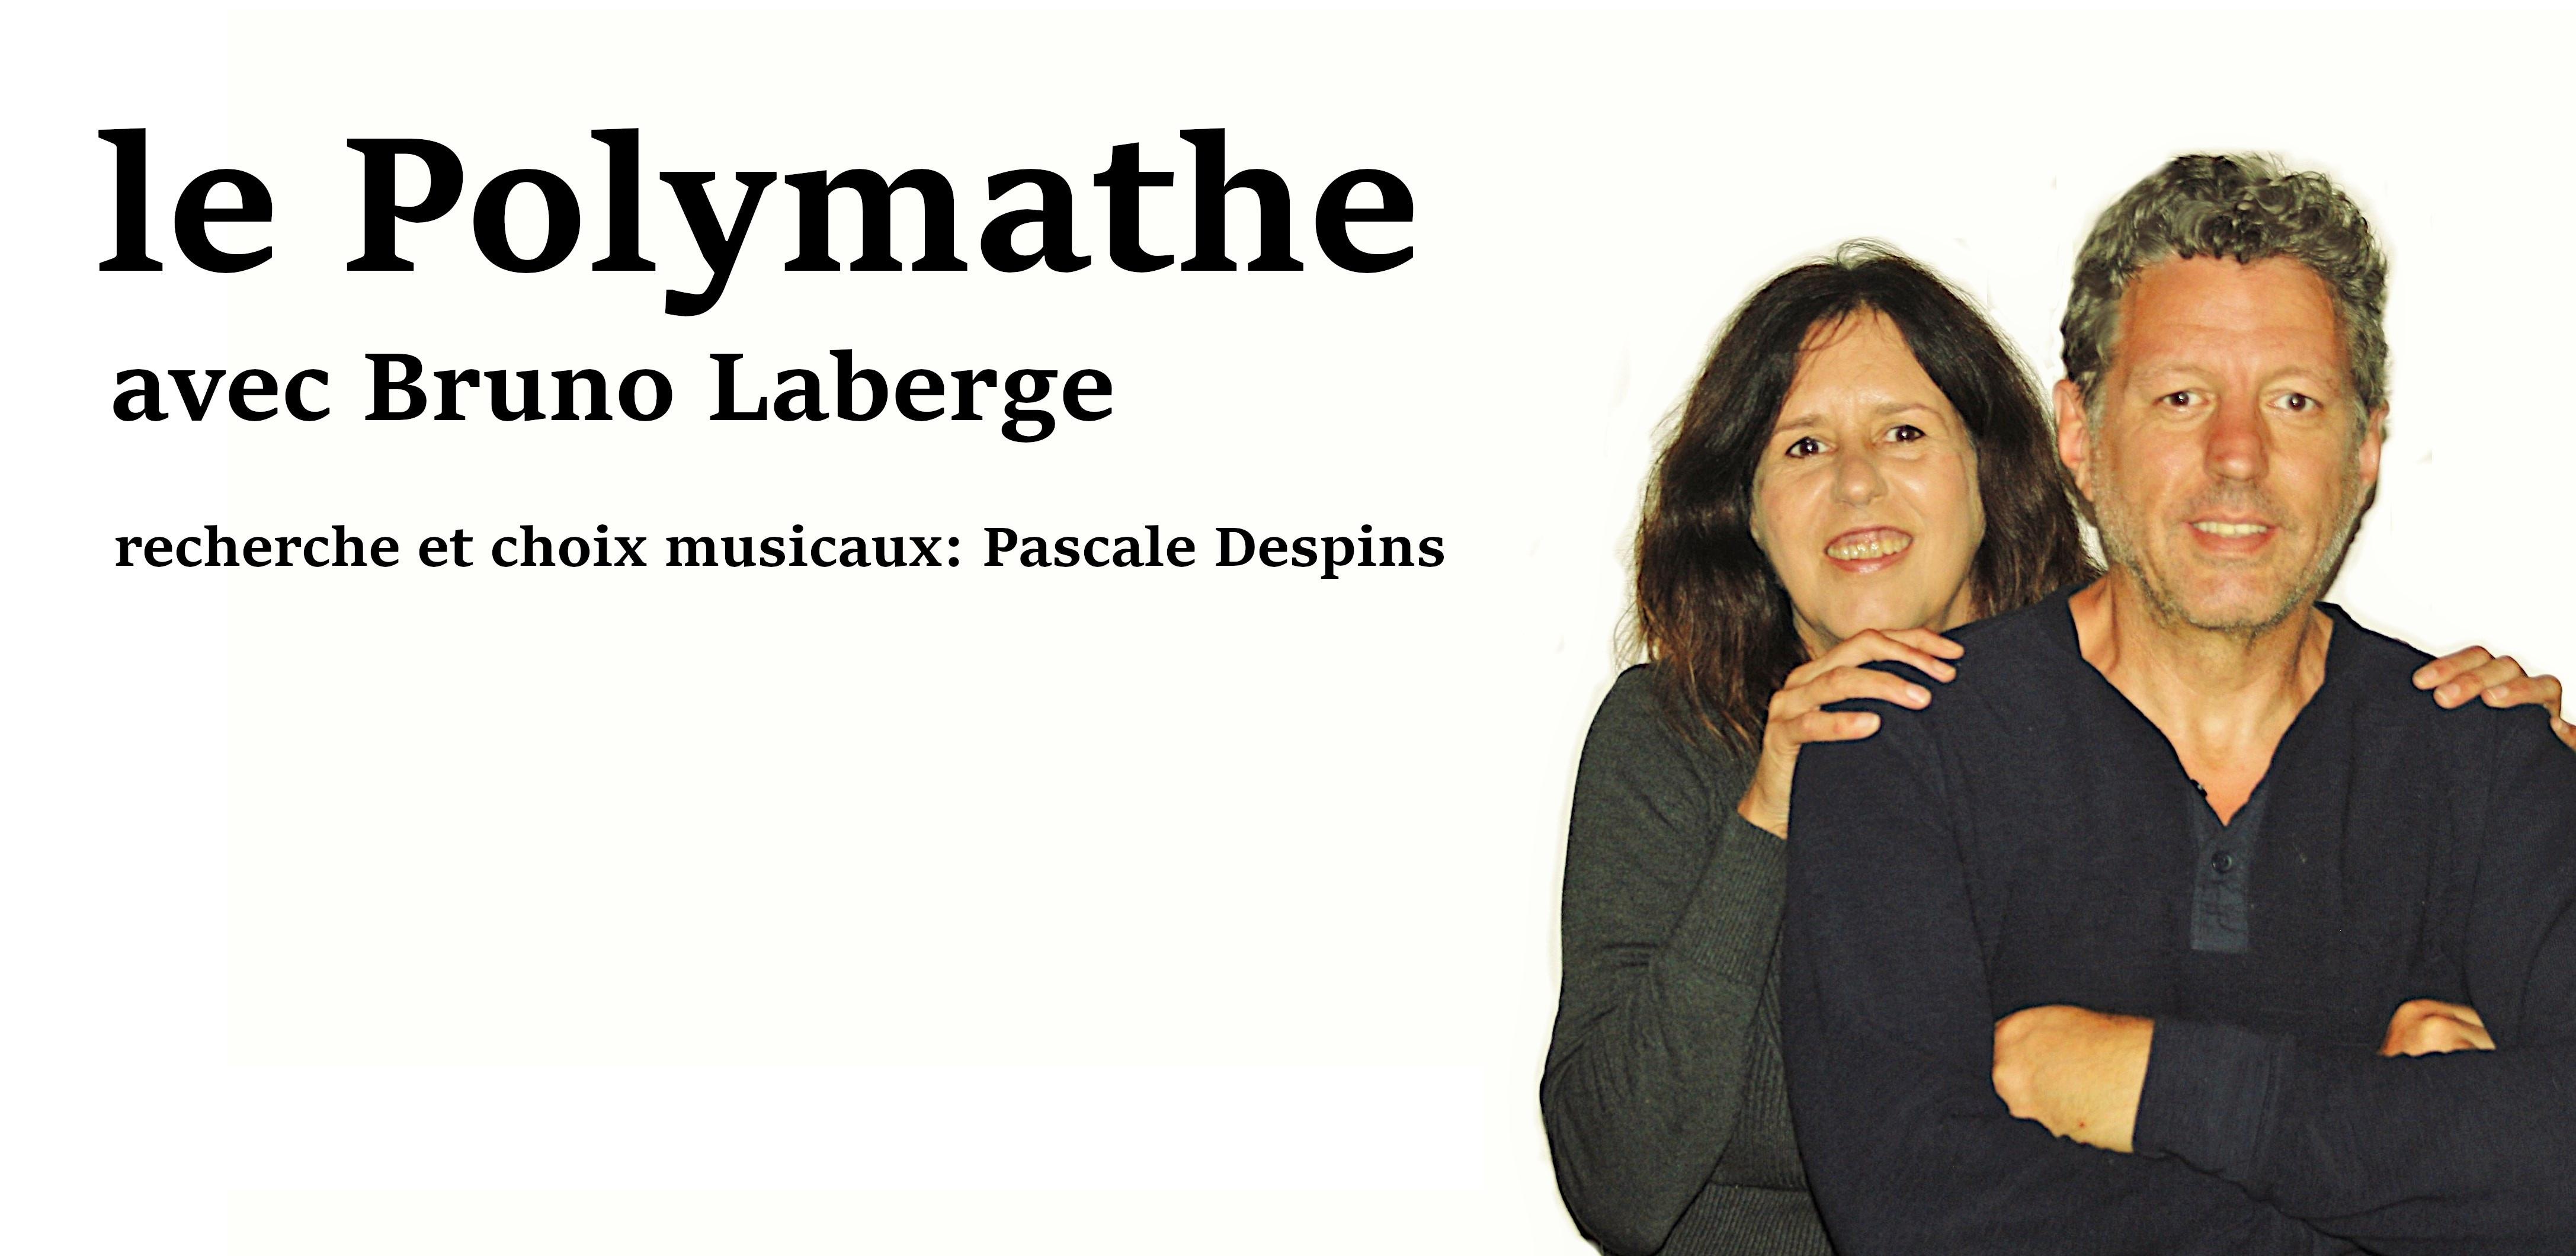 Le polymathe